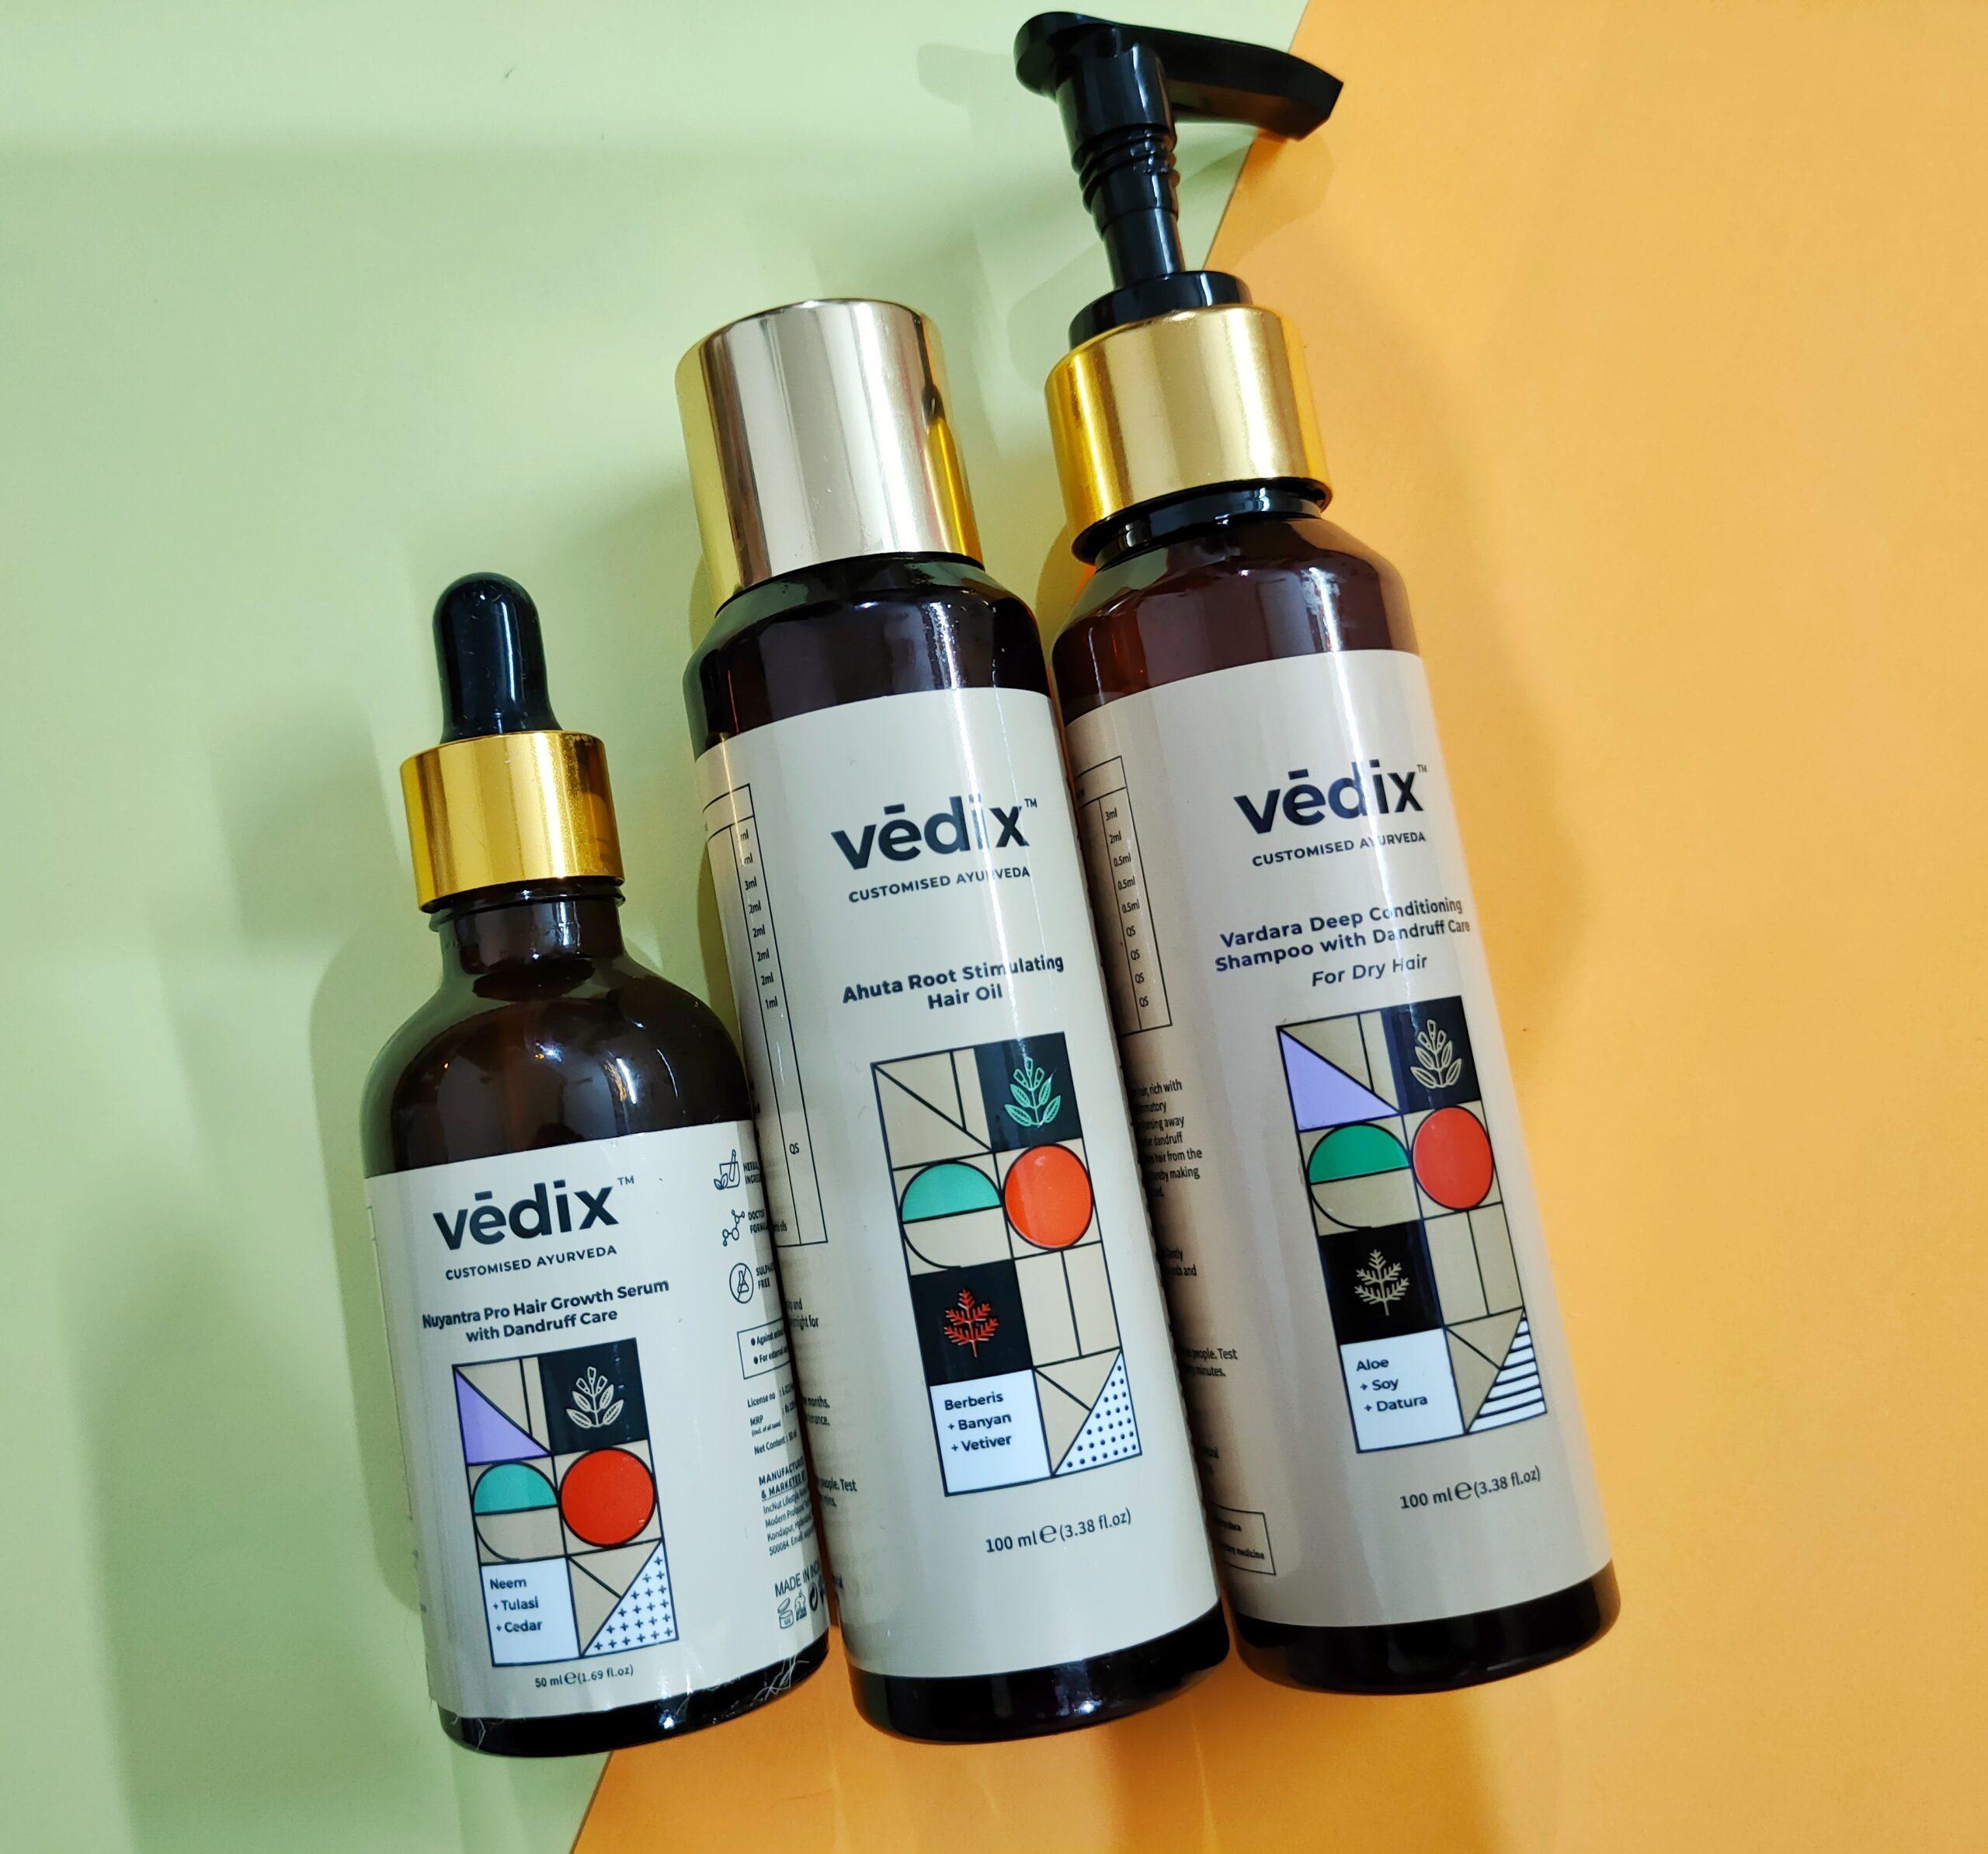 Vedix Customized Ayurvedic Haircare Regimen Review